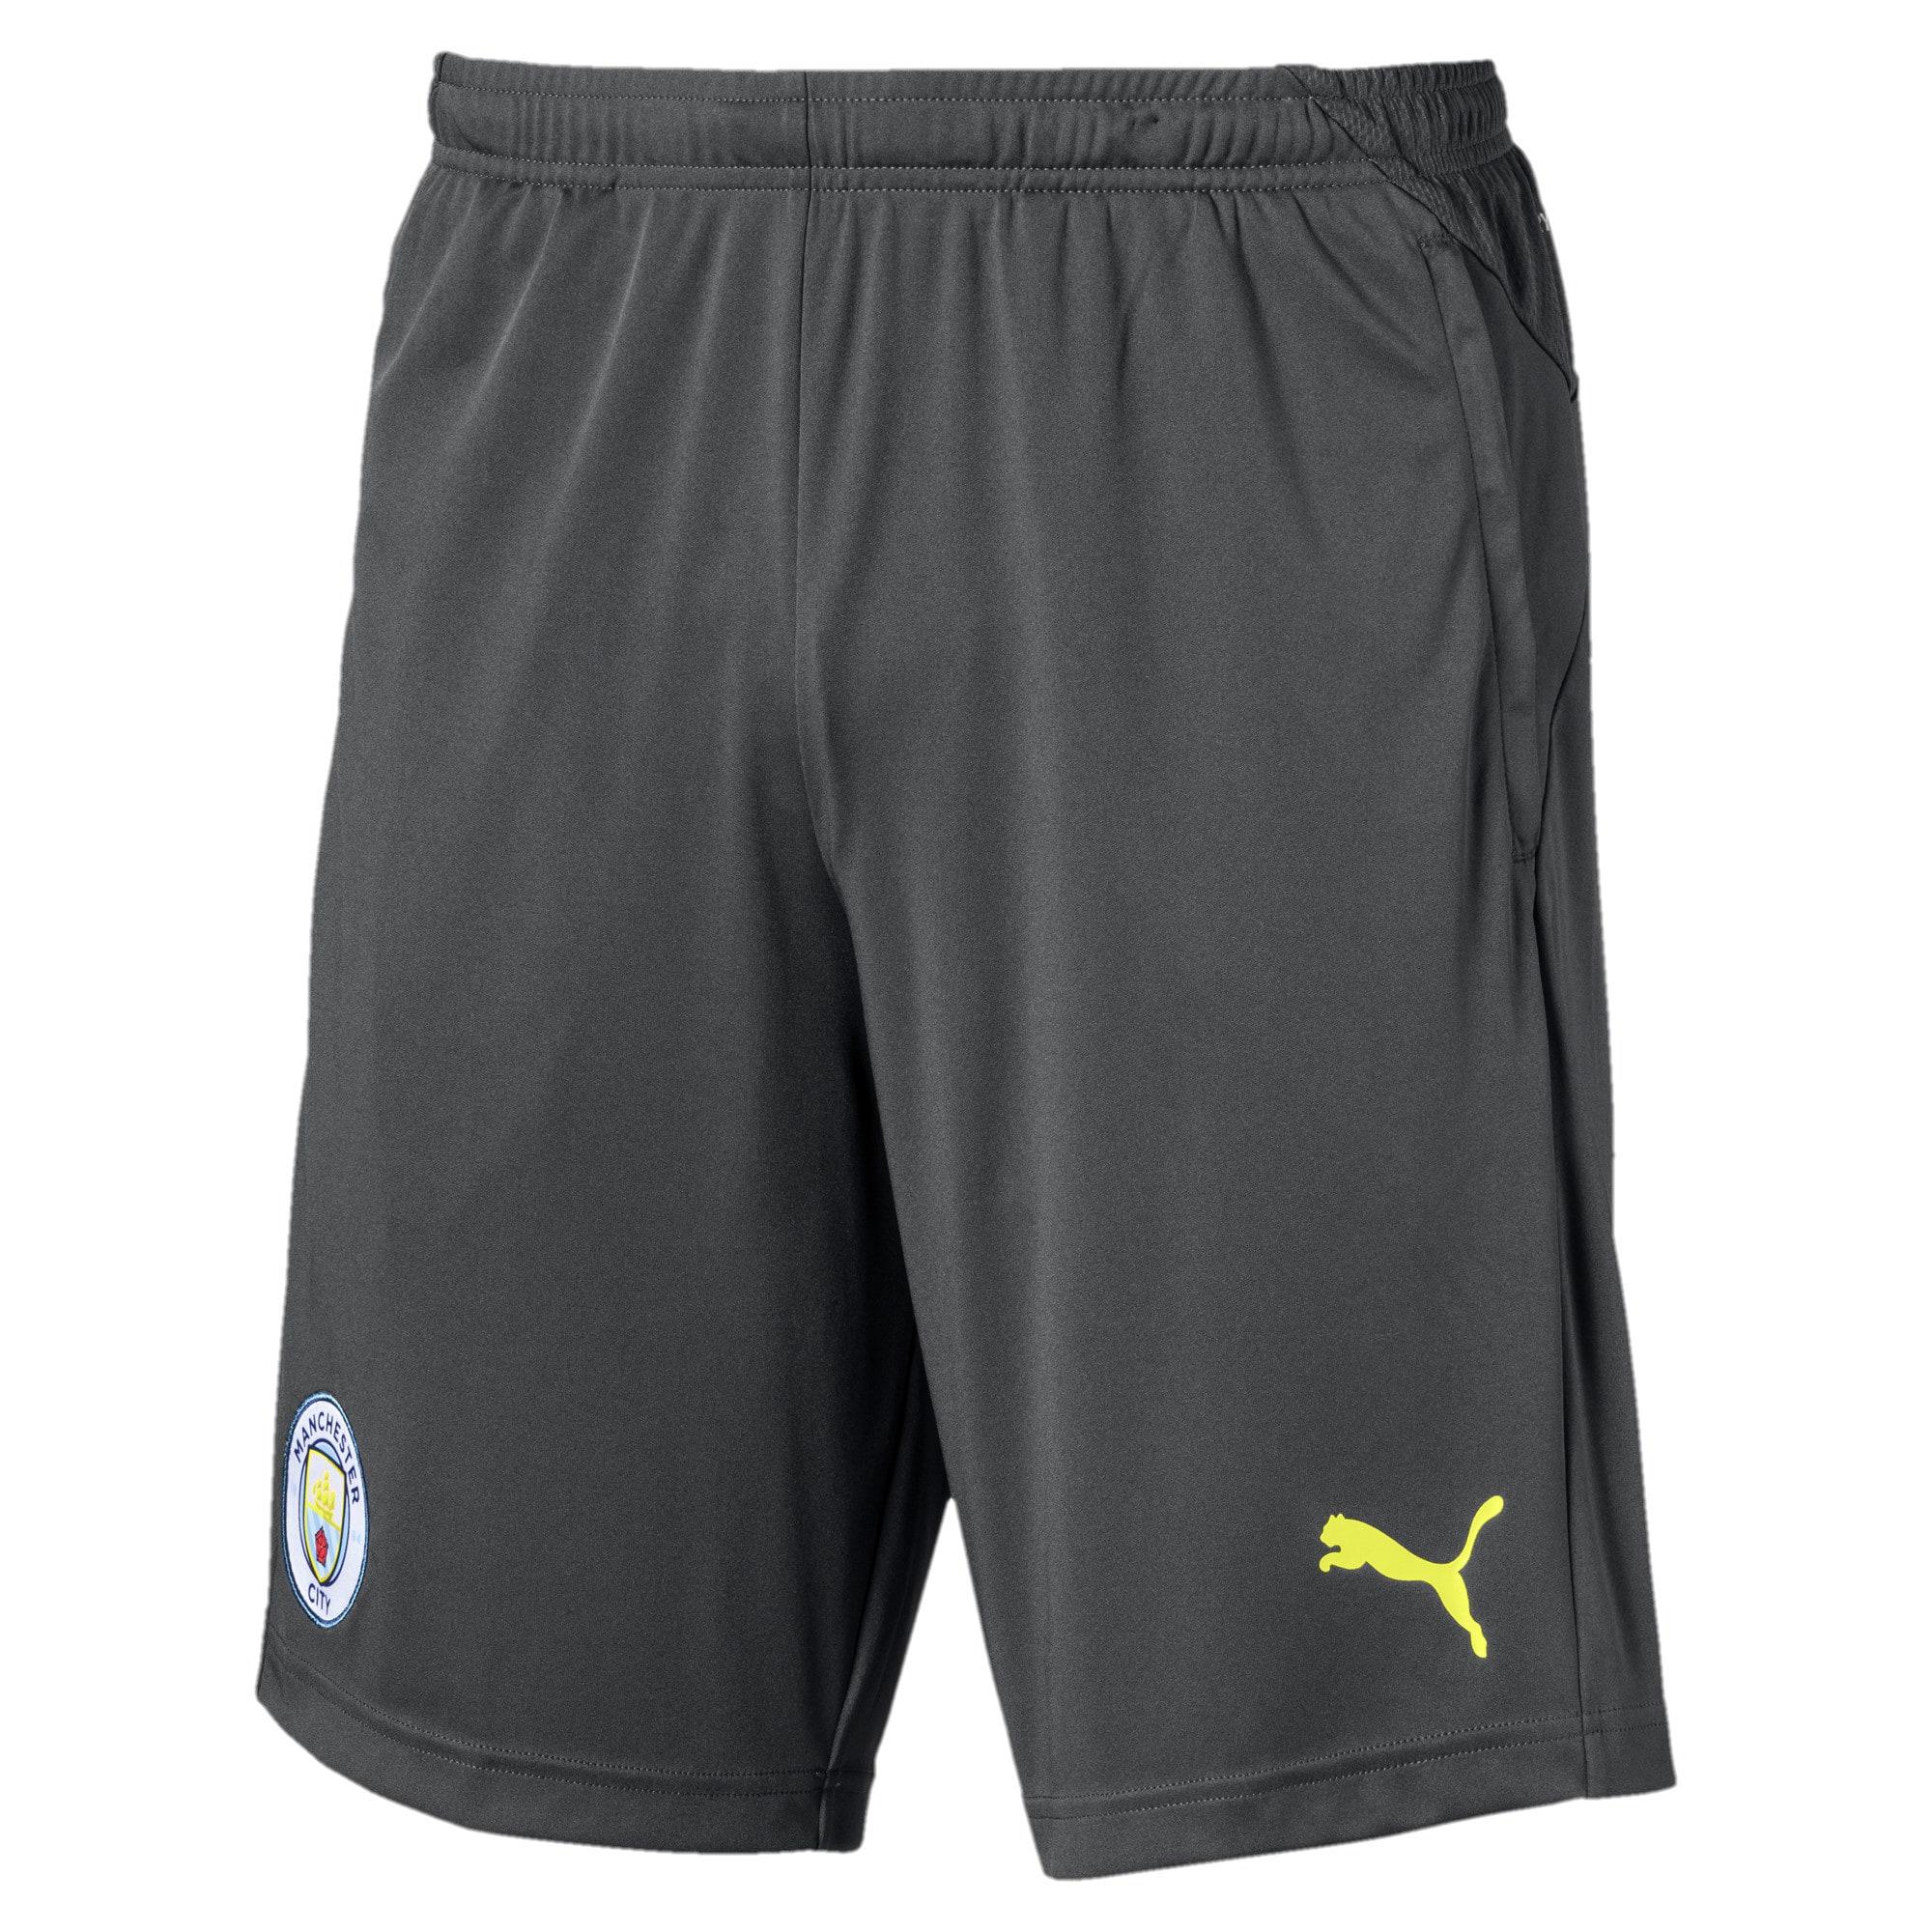 Thumbnail 1 of Manchester City FC Men's Training Shorts, Asphalt-Fizzy Yellow, medium